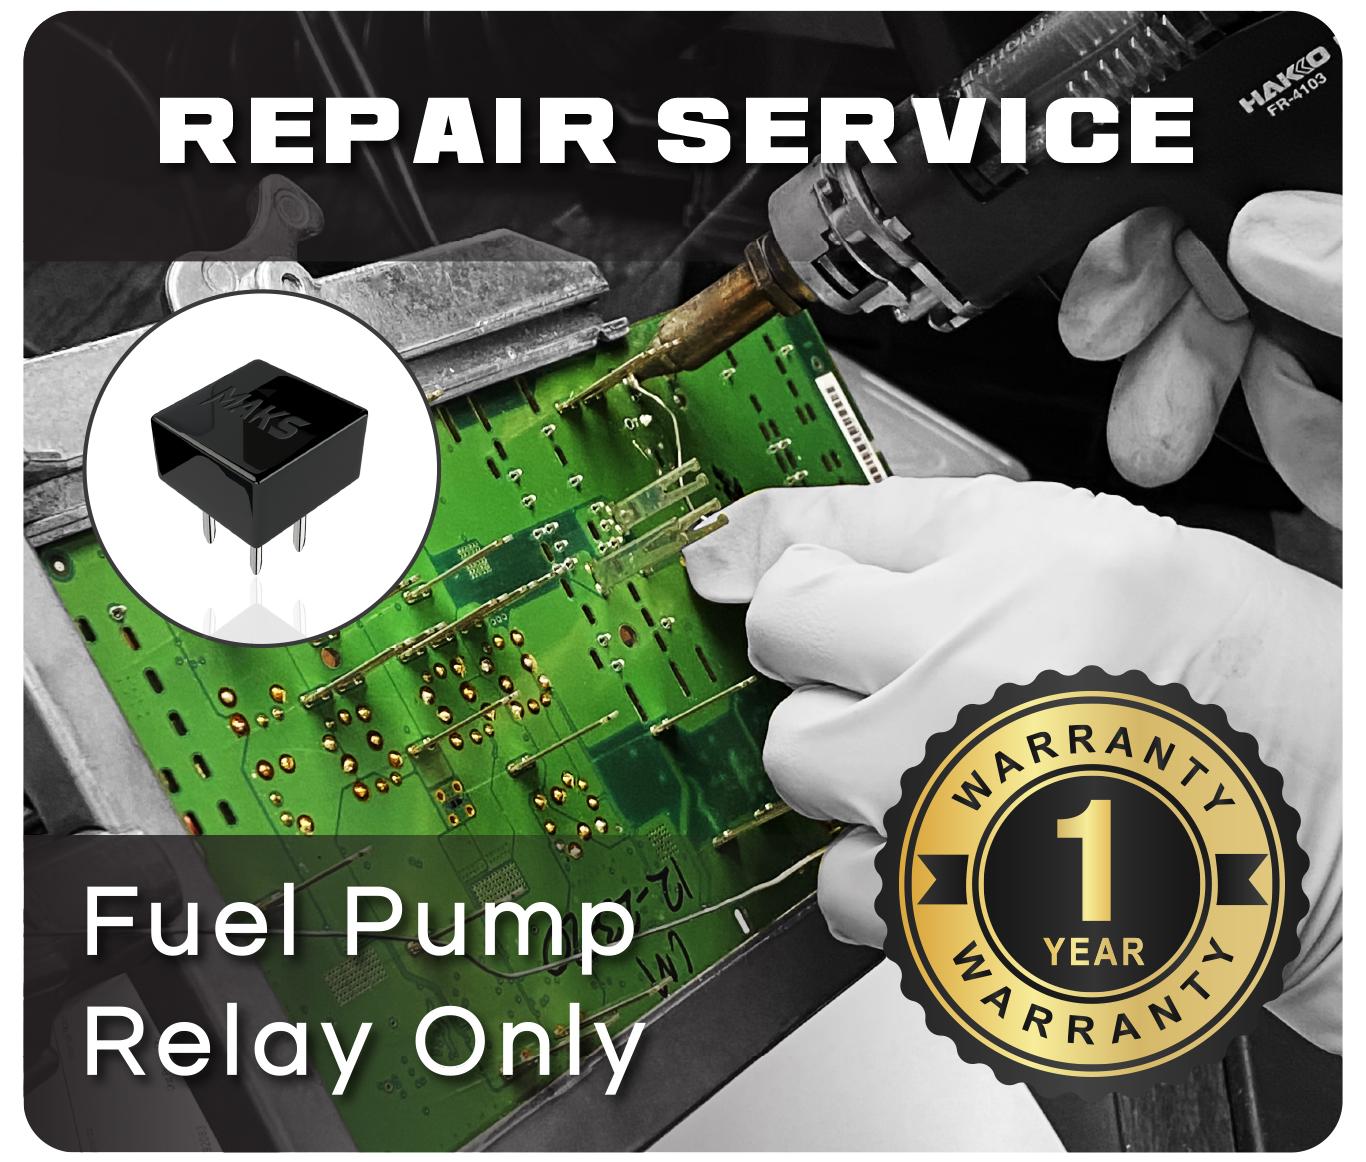 2009 2010 Dodge Ram Fuel Pump Relay Repair Service